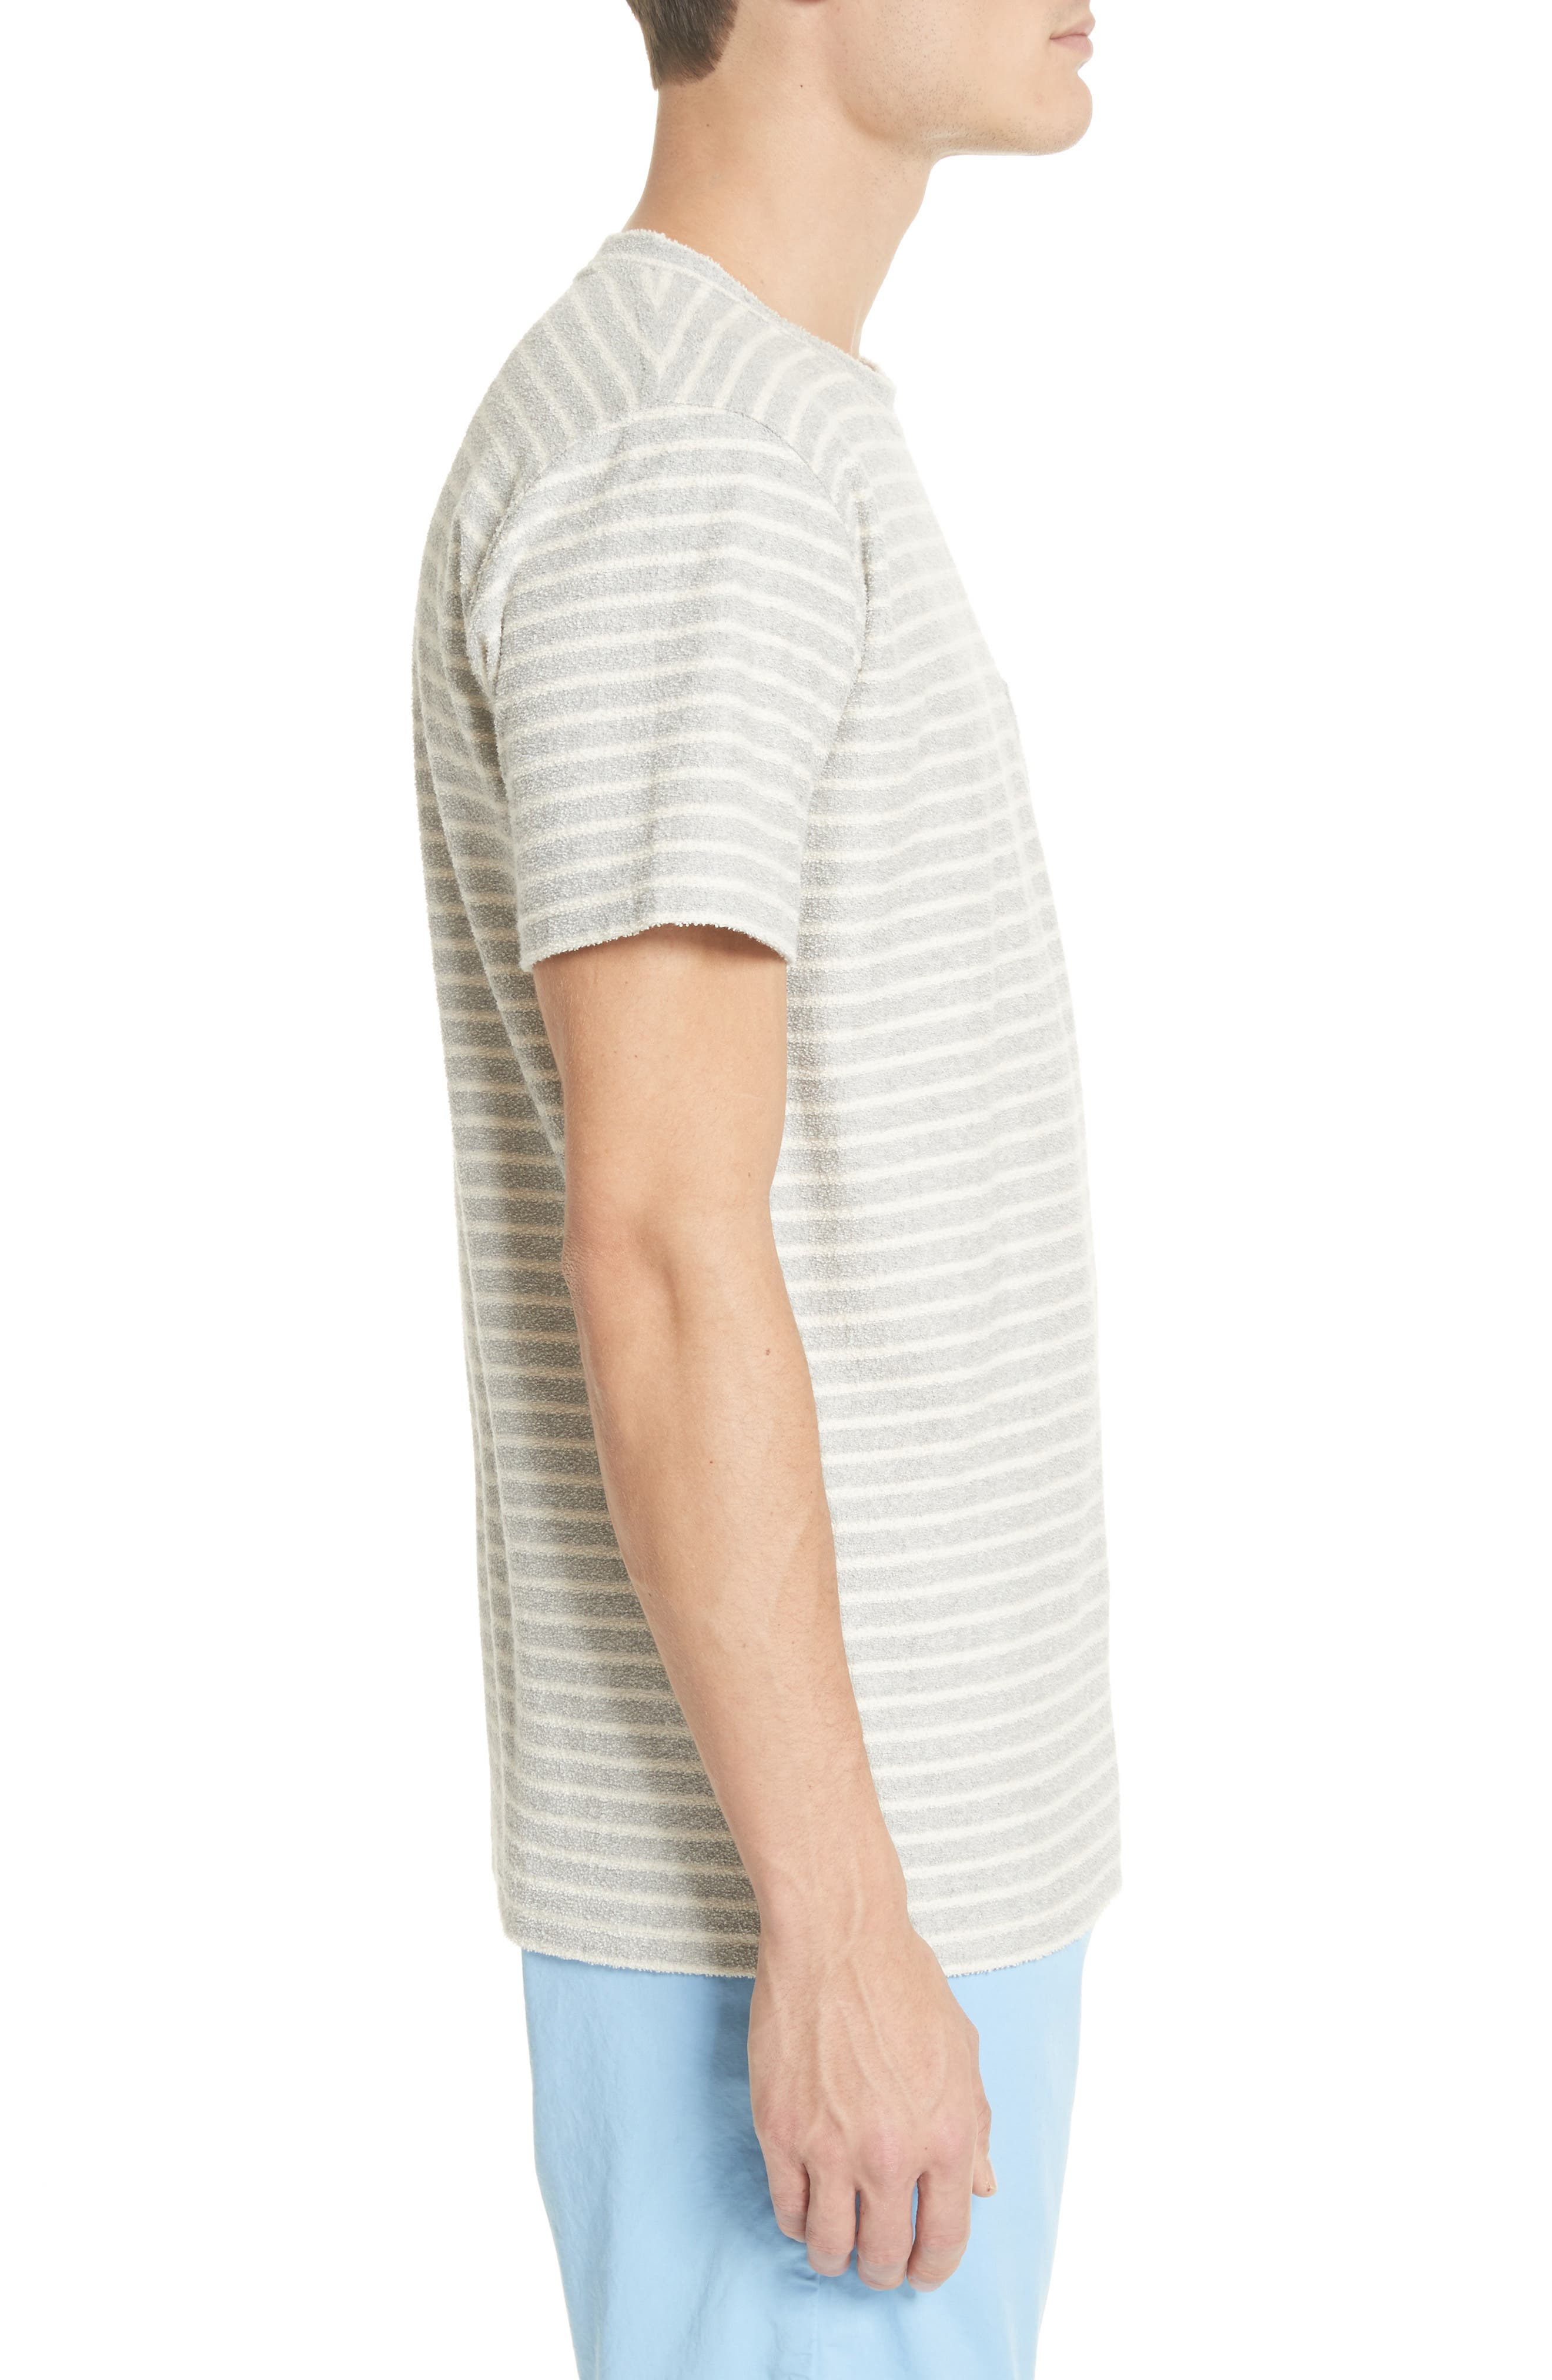 Niels Stripe Pocket T-Shirt,                             Alternate thumbnail 3, color,                             050